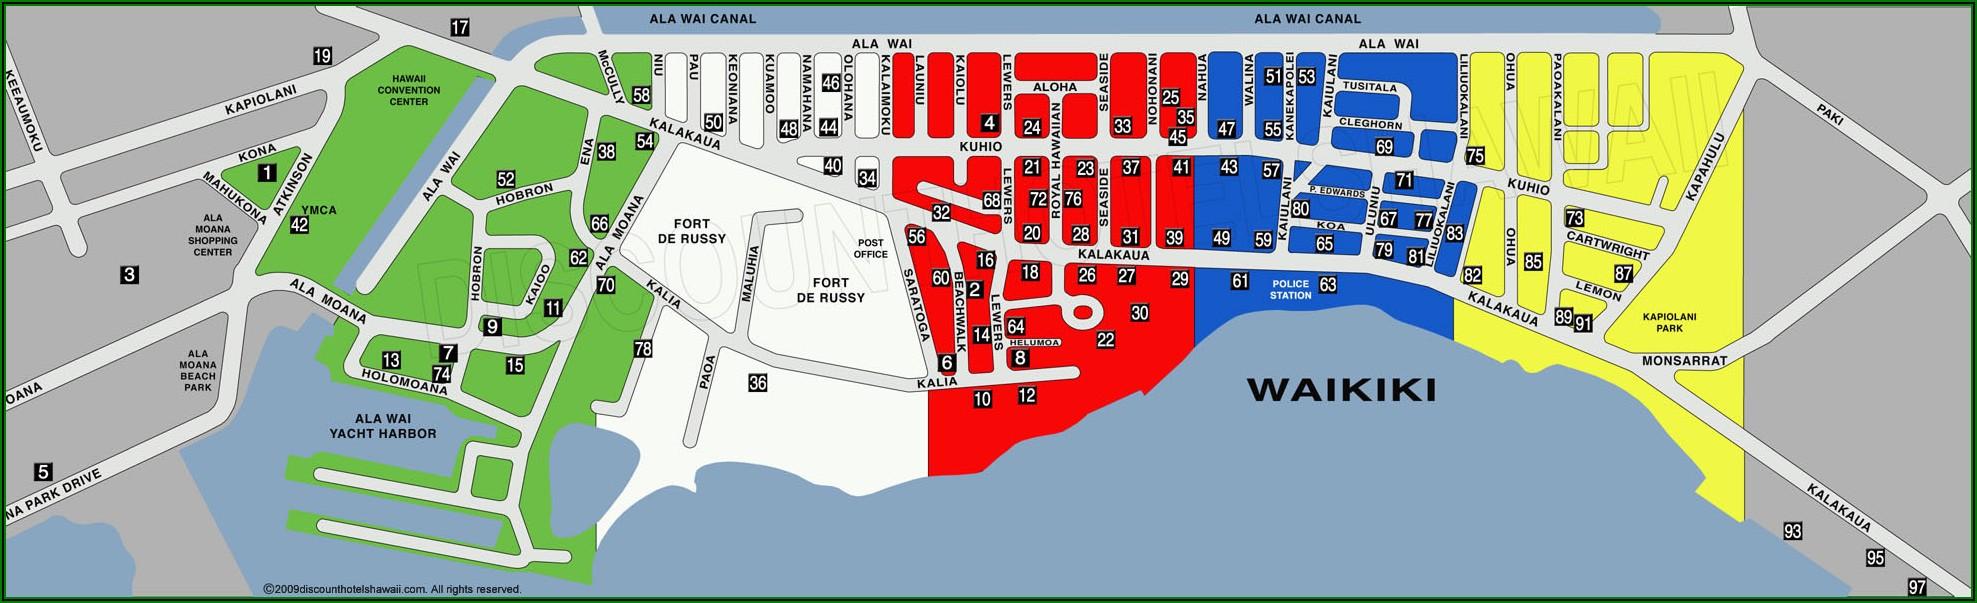 Map Of Hotels Along Waikiki Beach